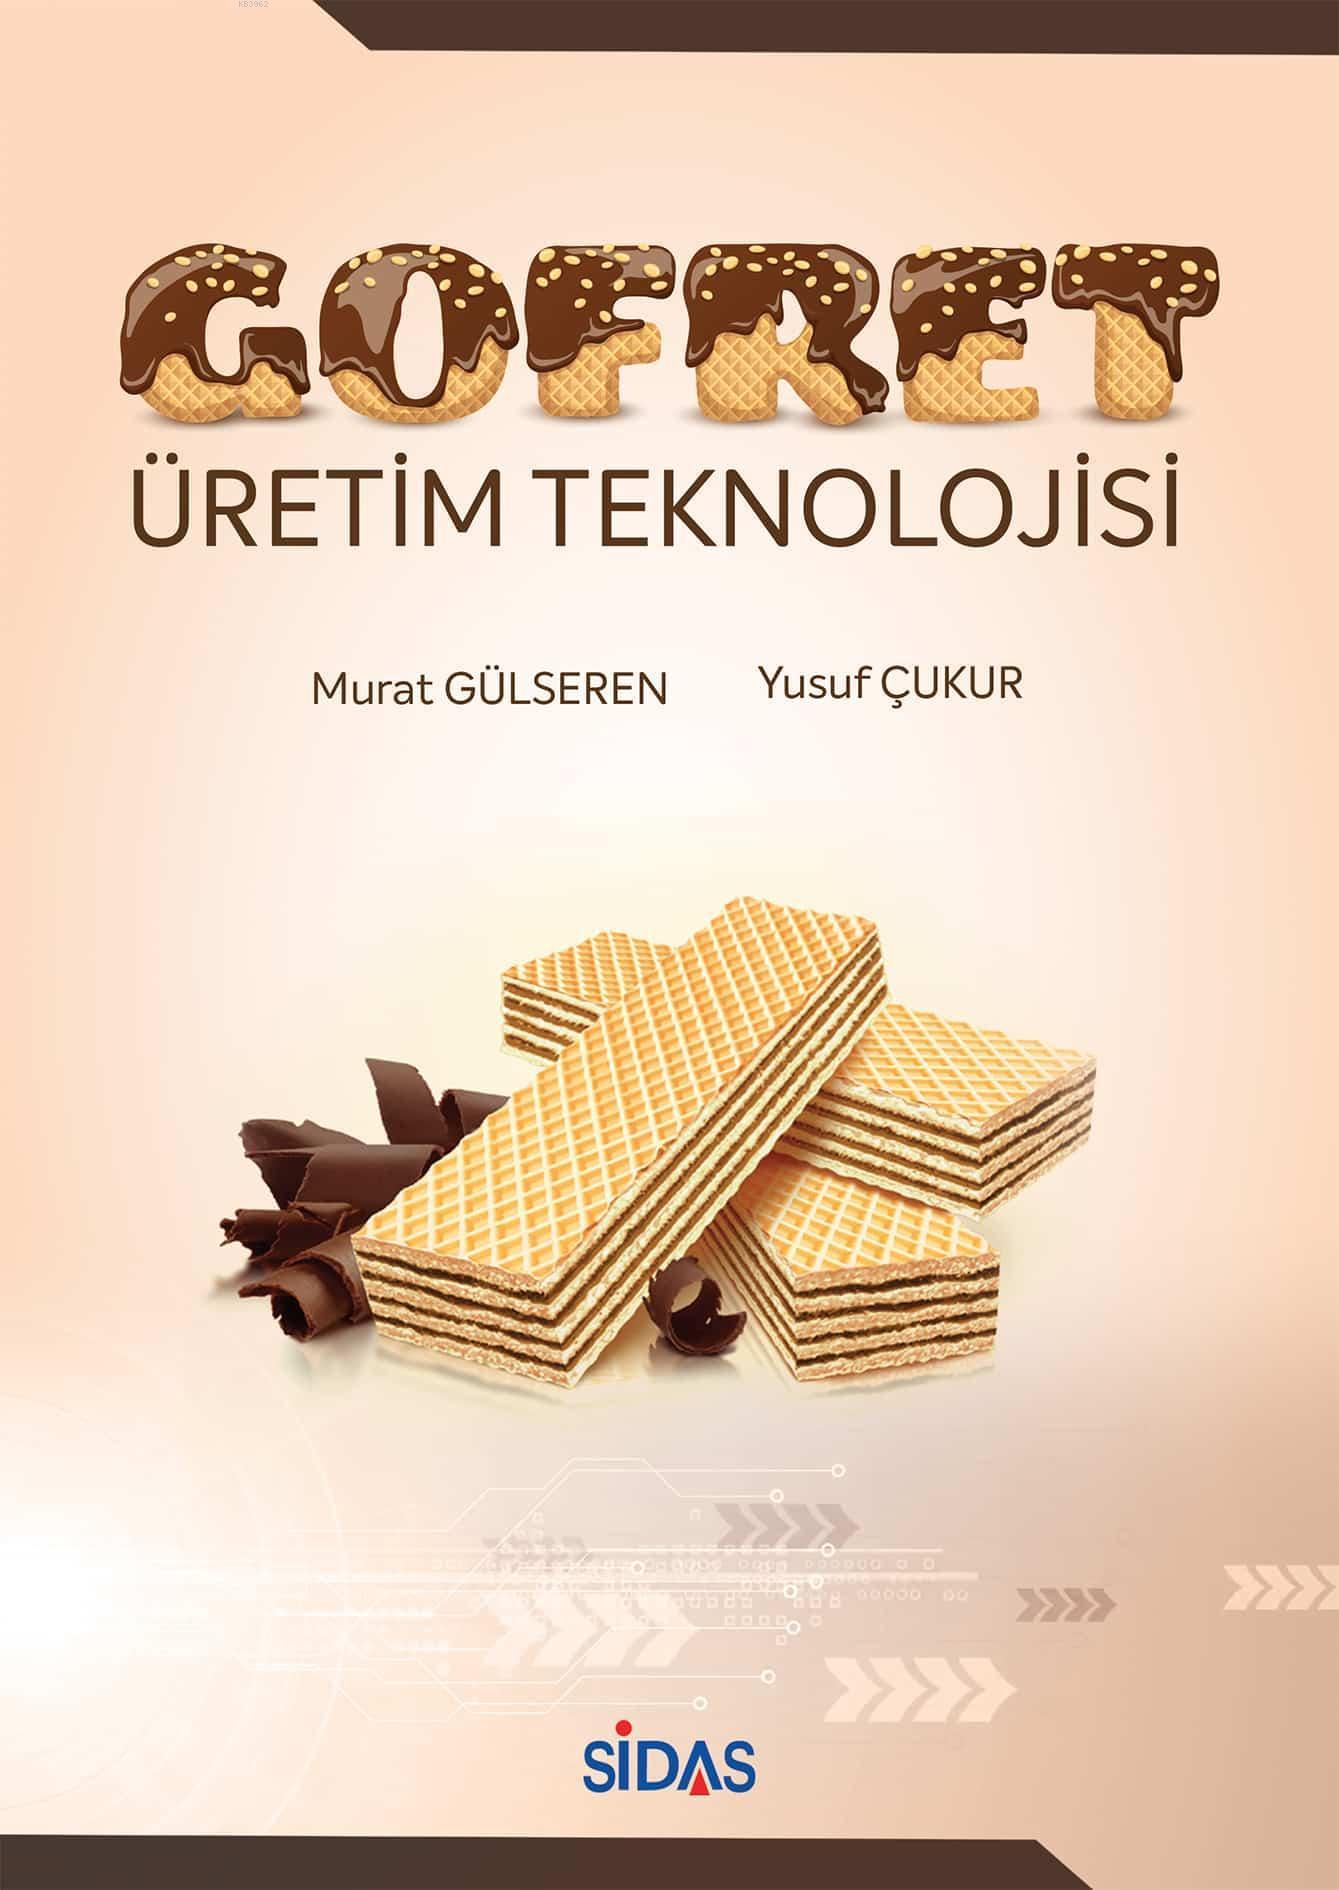 GOFRET ÜRETİM TEKNOLOJİSİ